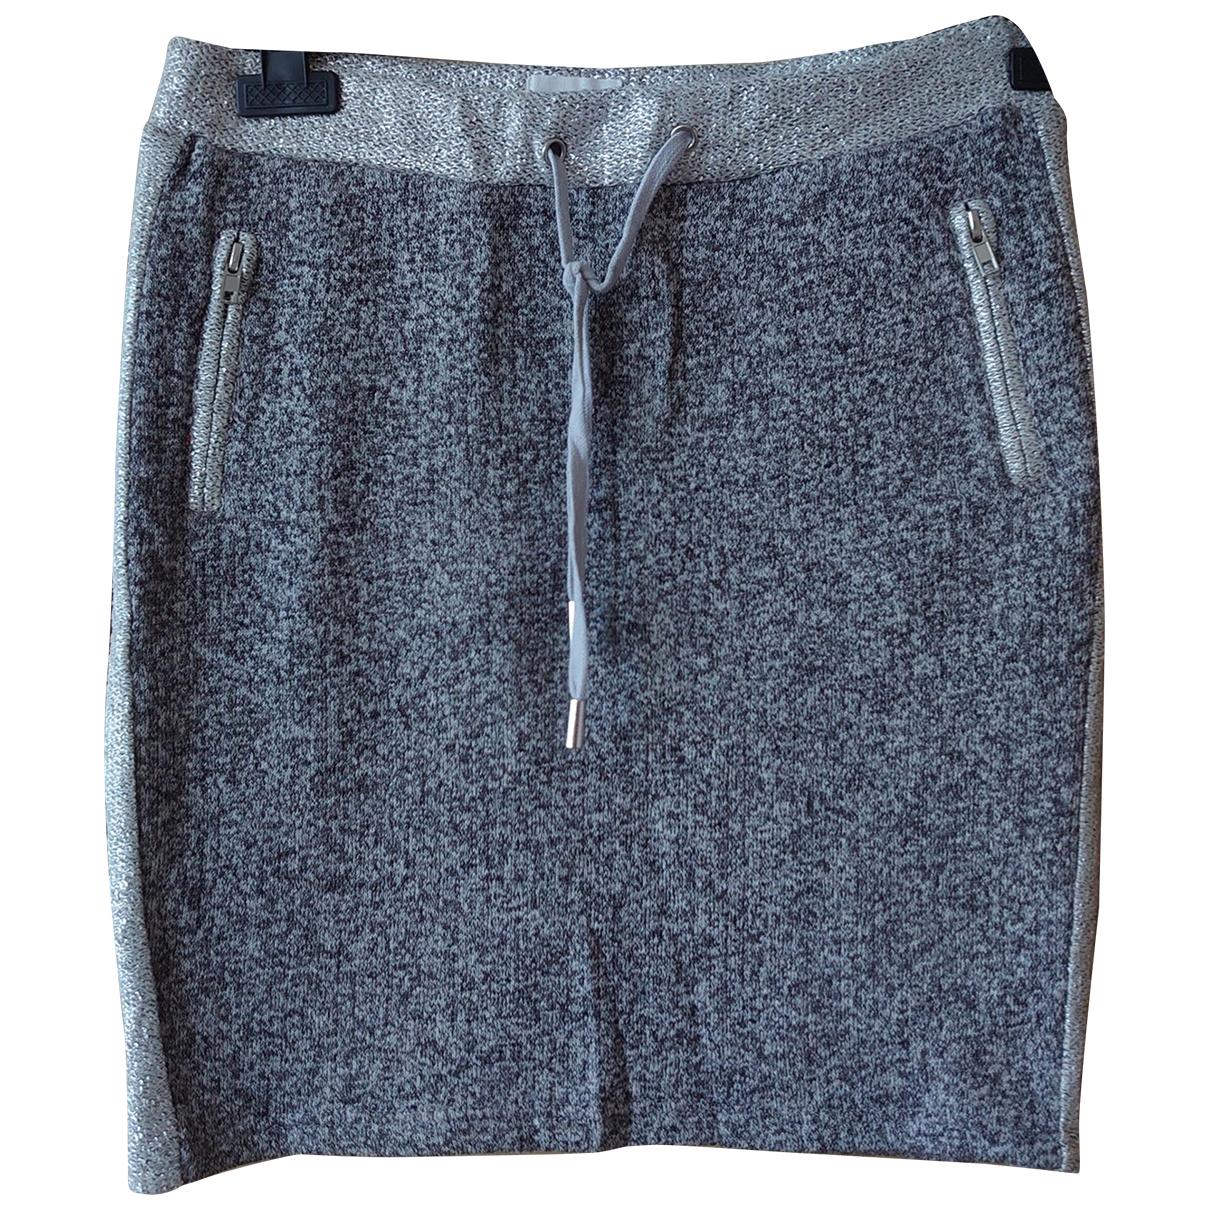 Bel Air \N Anthracite Cotton - elasthane skirt for Women 38 FR